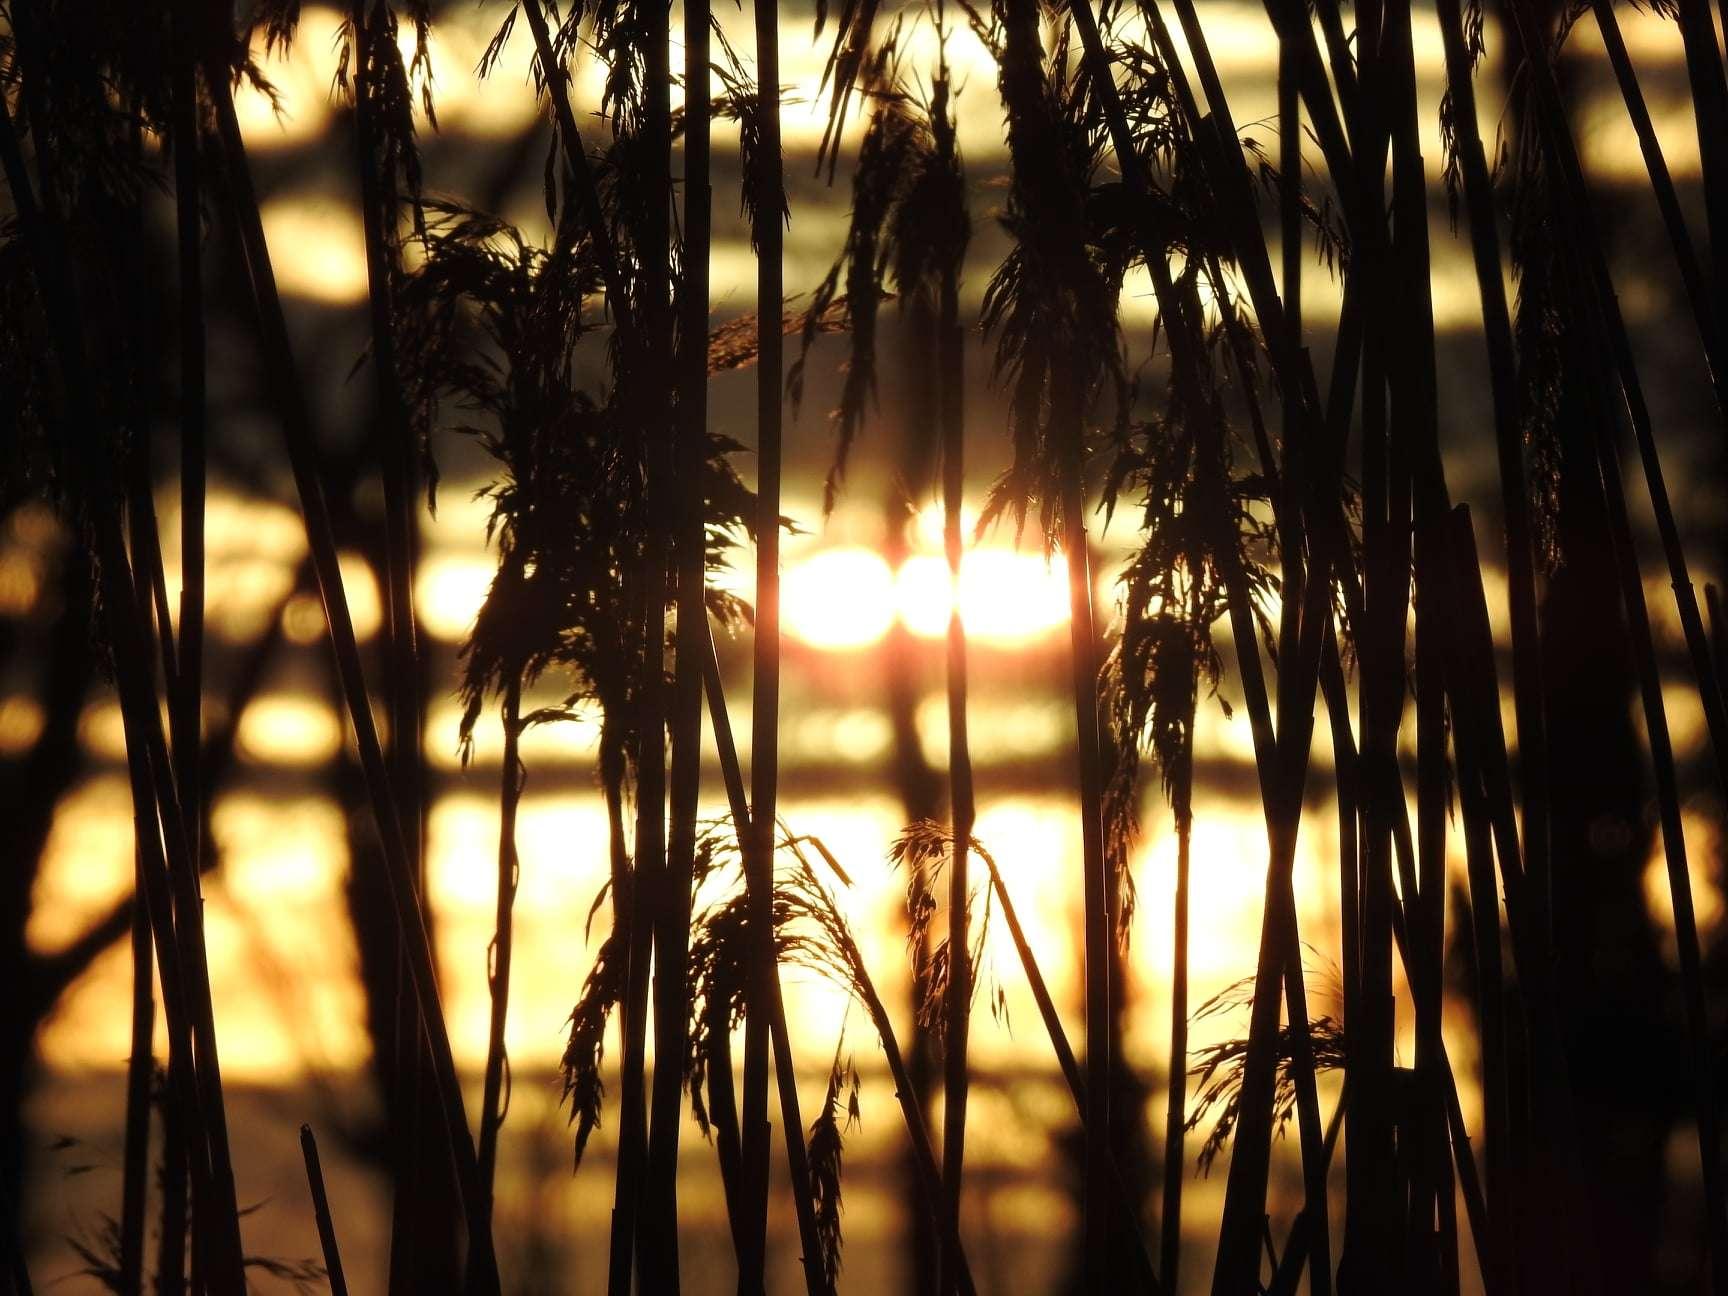 Sunset behind bullrushes at lake